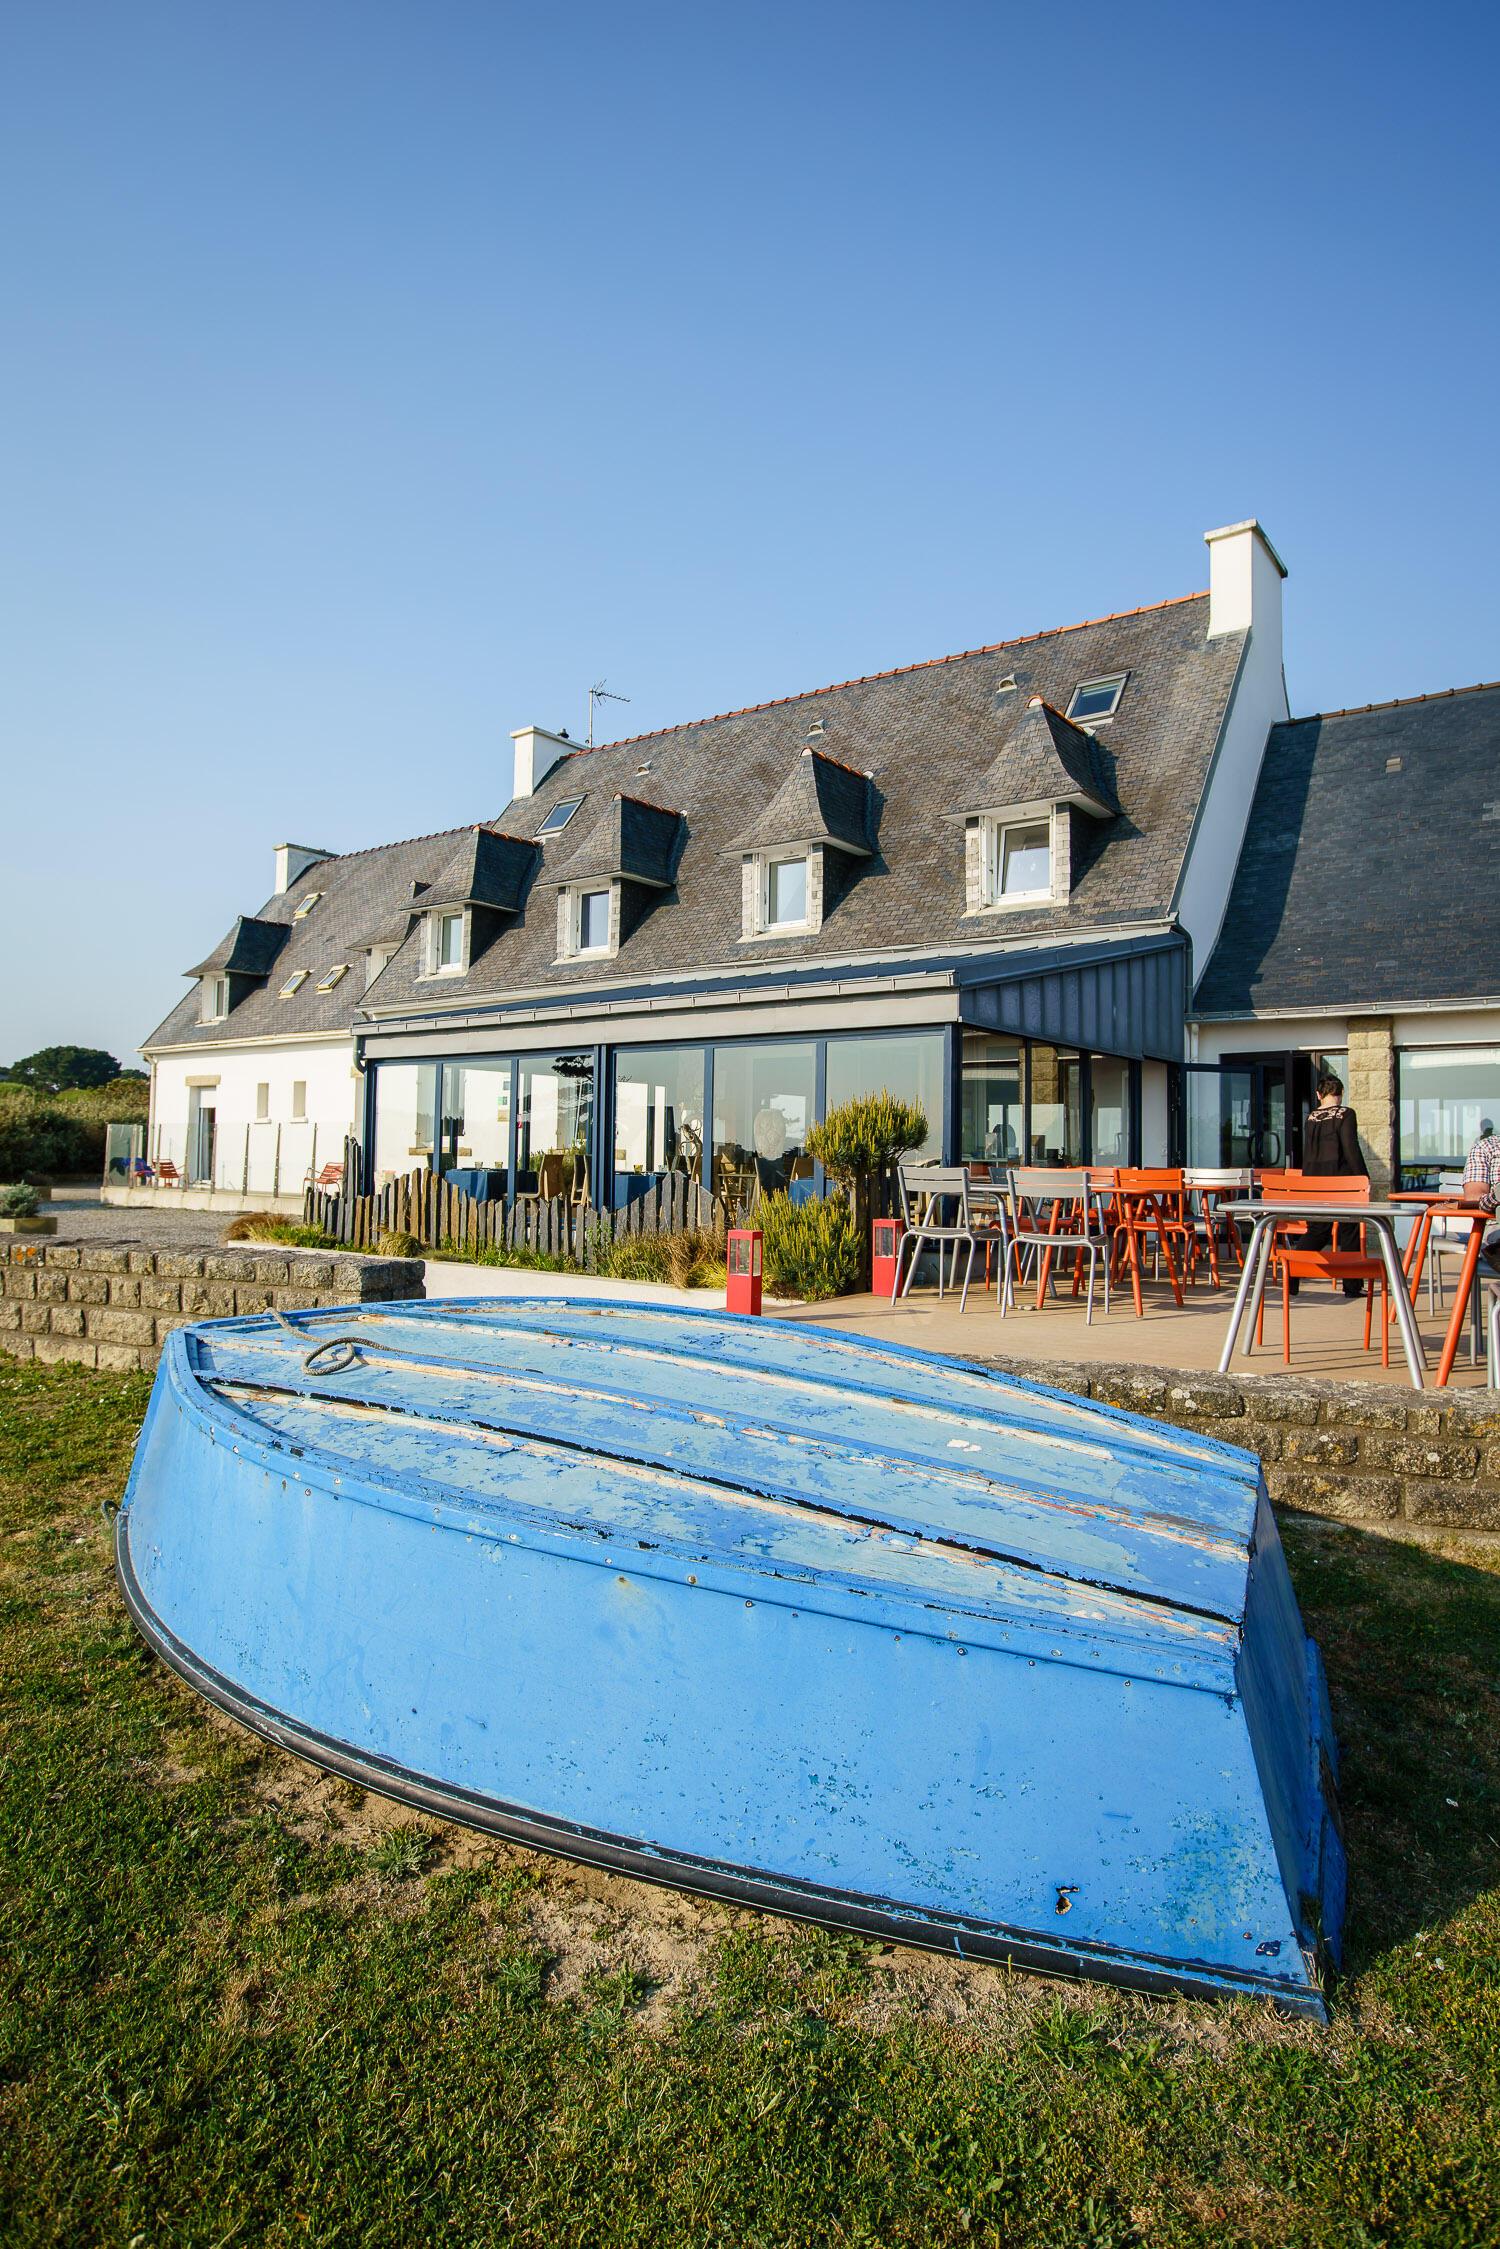 Ar Men Du Hotel in Névez, Brittany